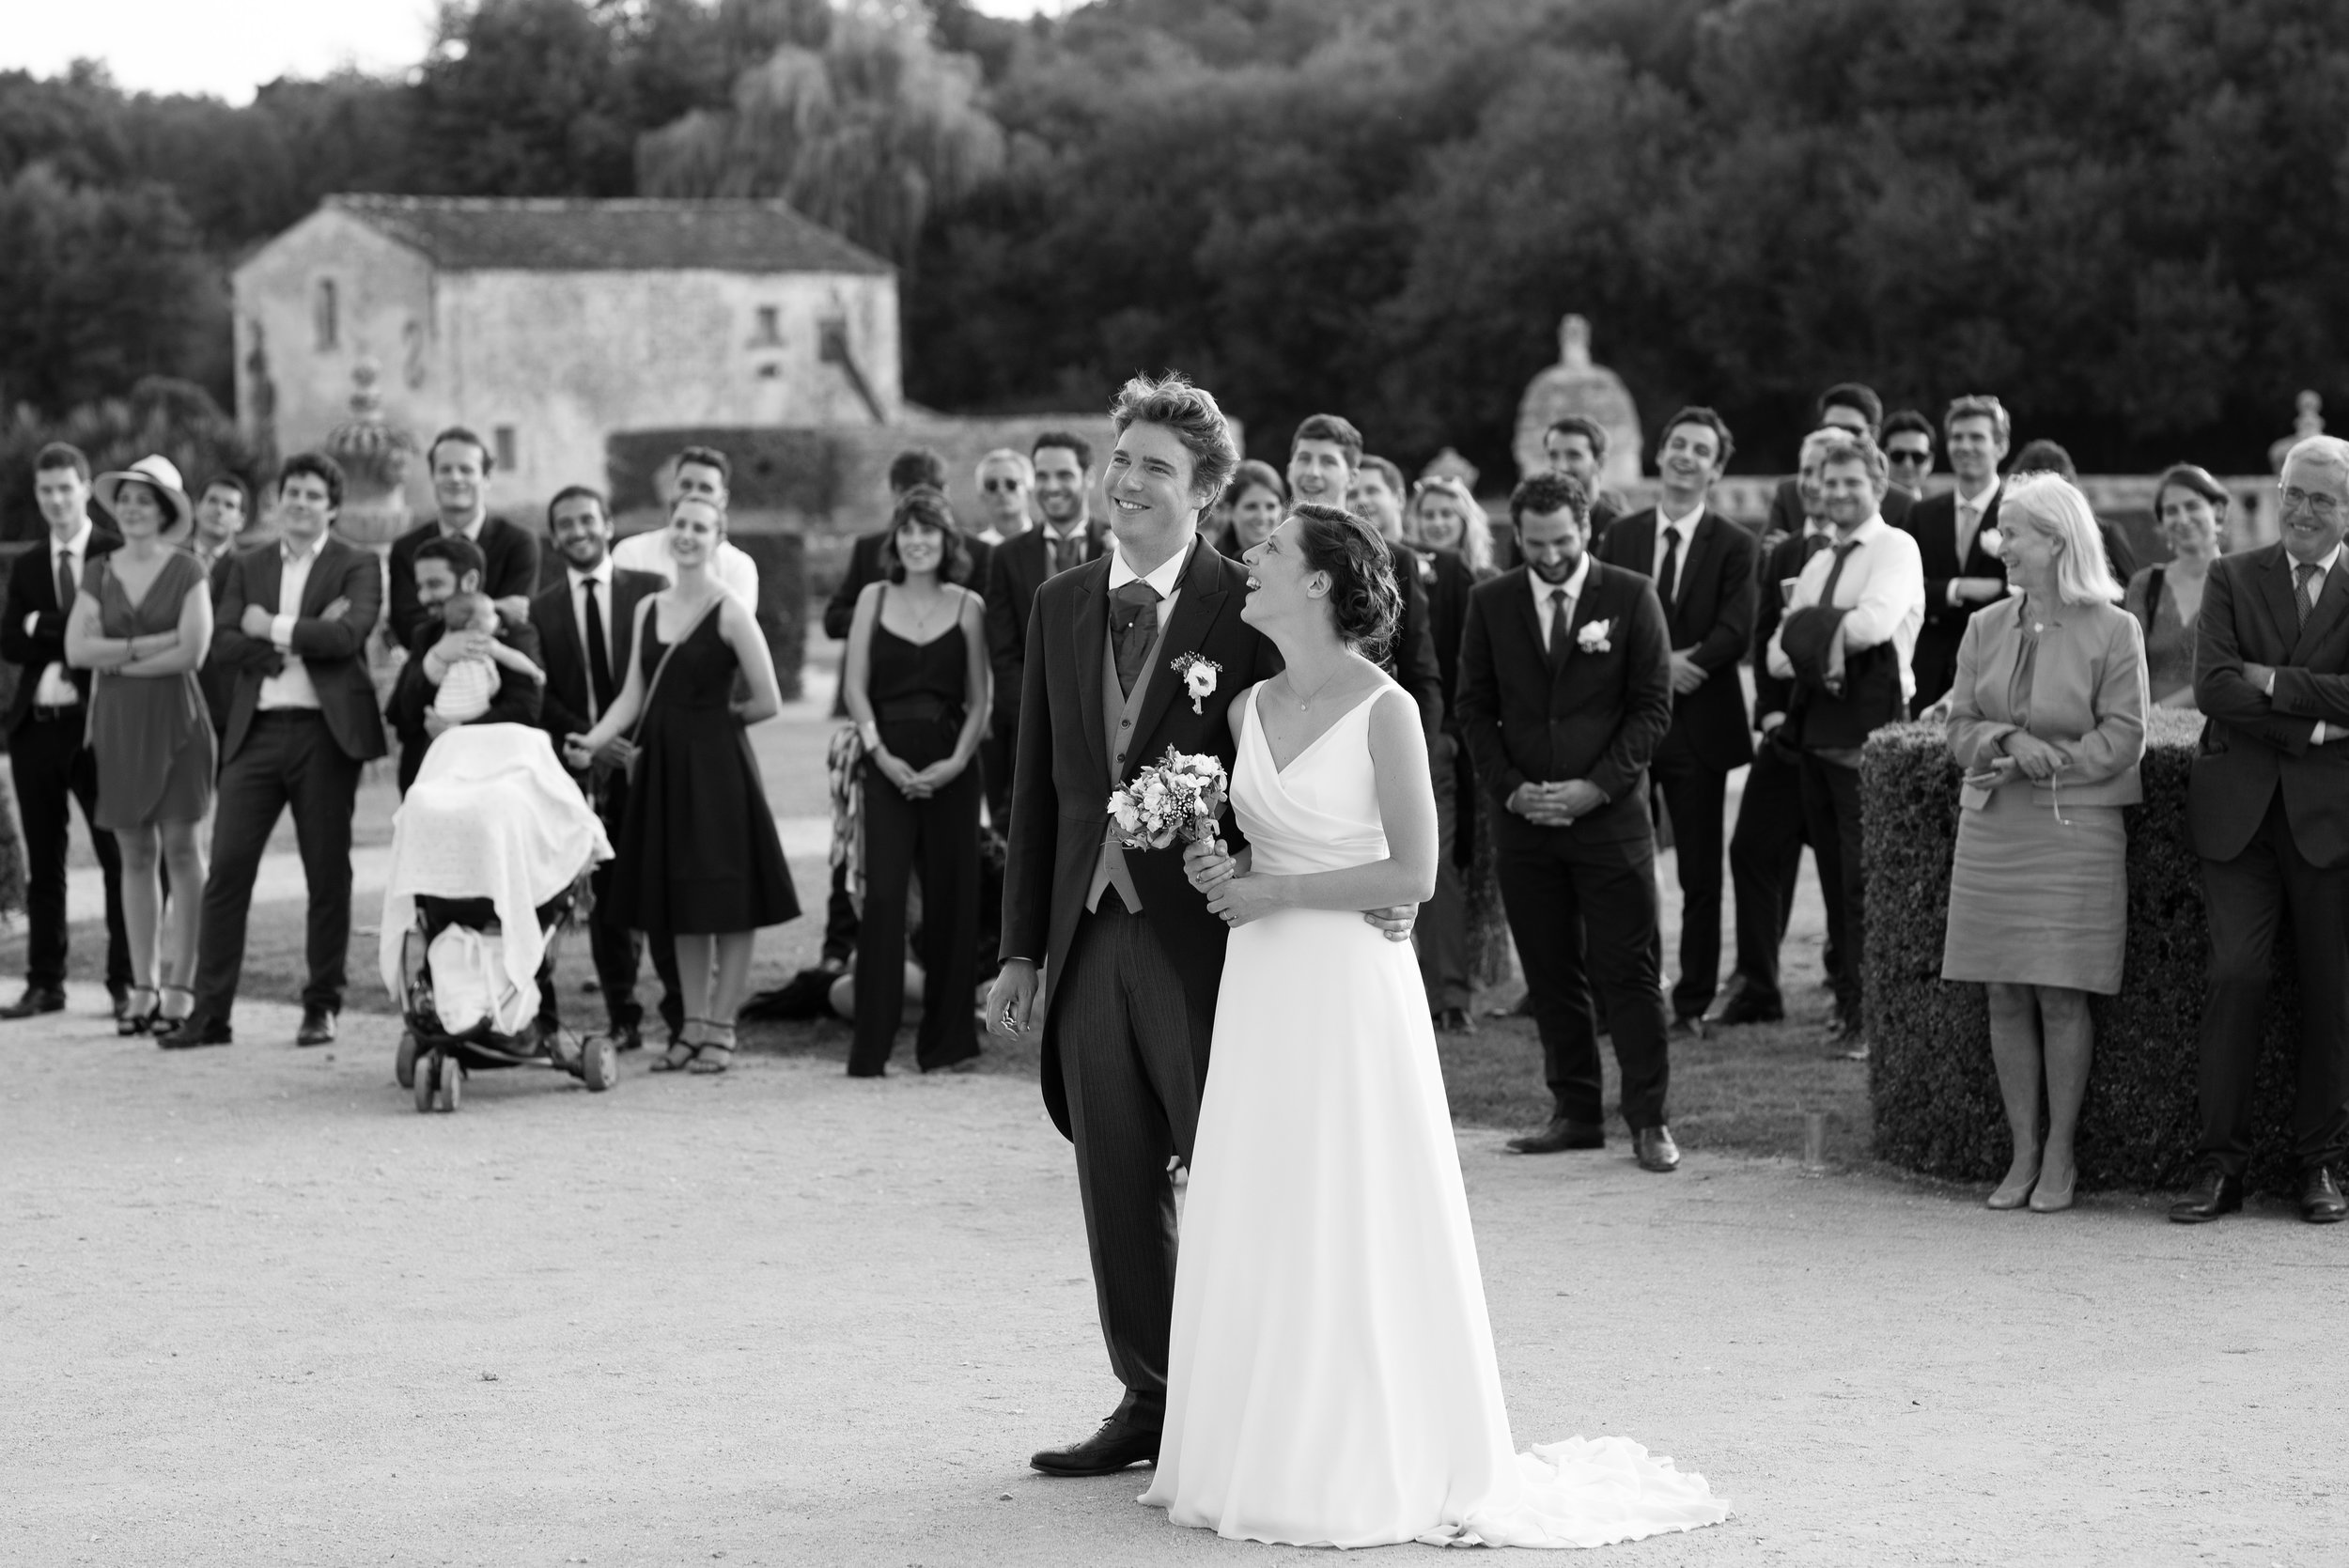 photographe-mariage-chateau-la-roche-courbon-444.jpg